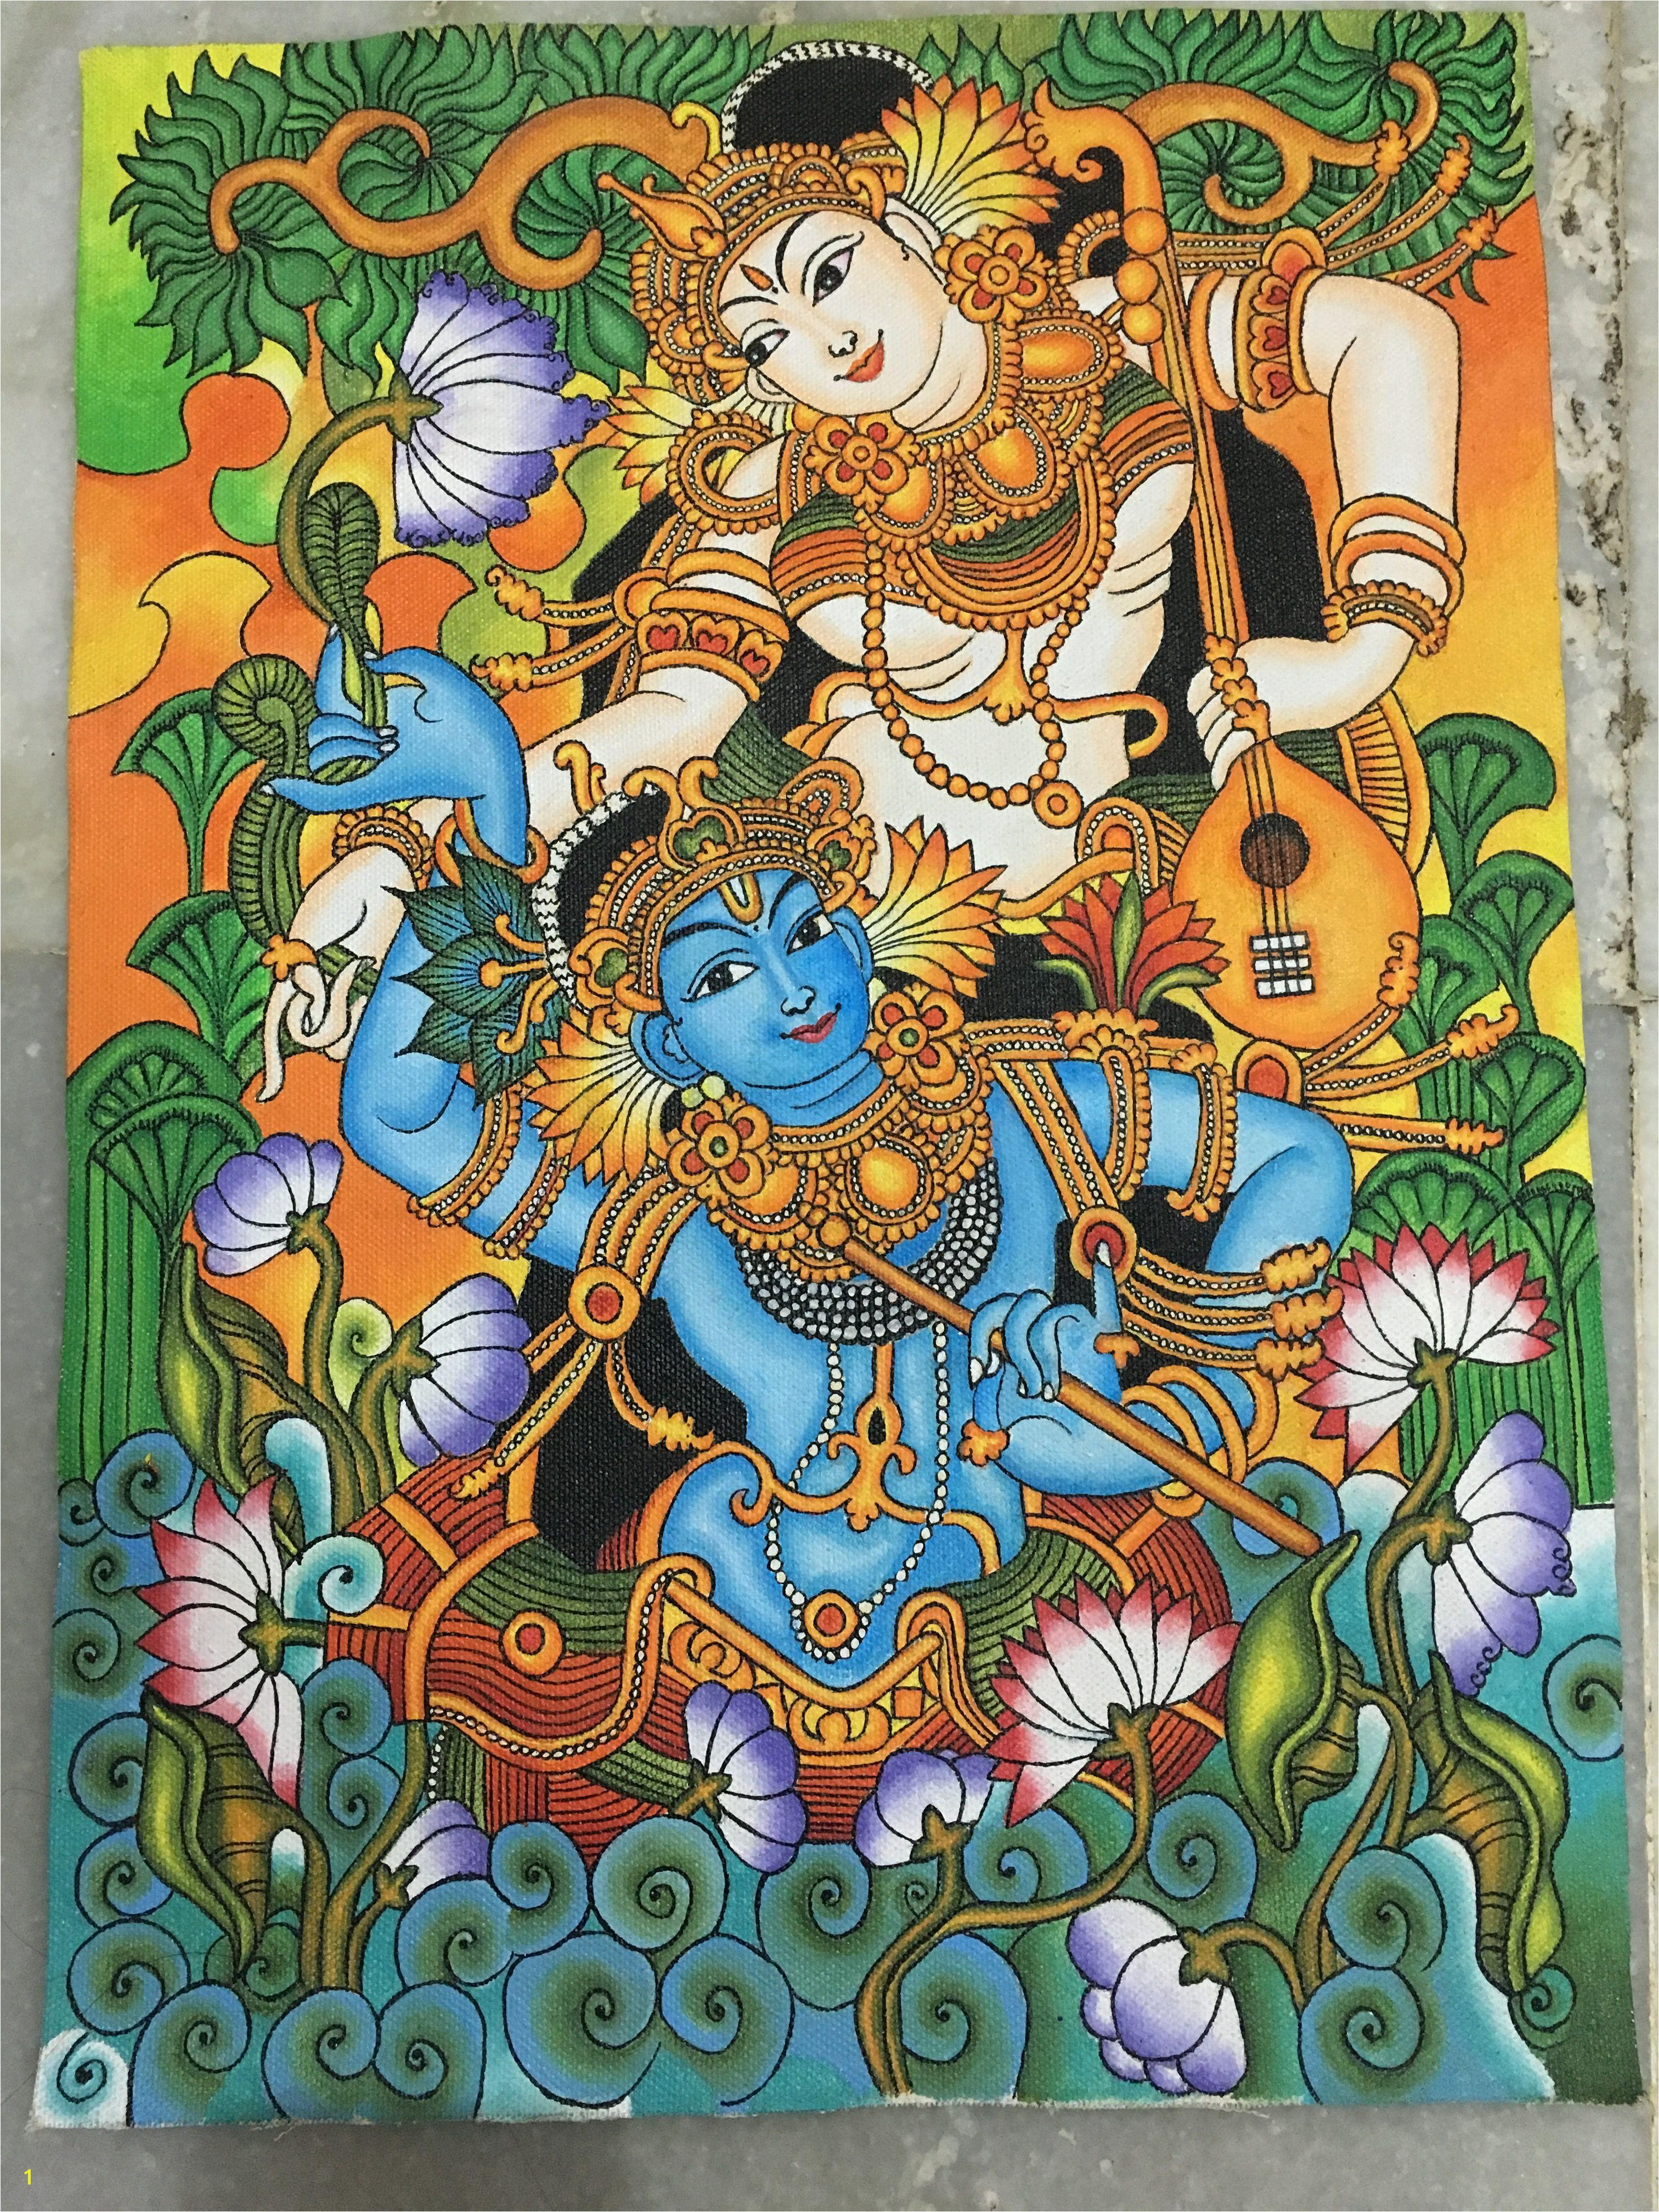 It s madhubani Radha Krishna painting Indian Art Paintings Kerala Mural Painting Indian Artwork